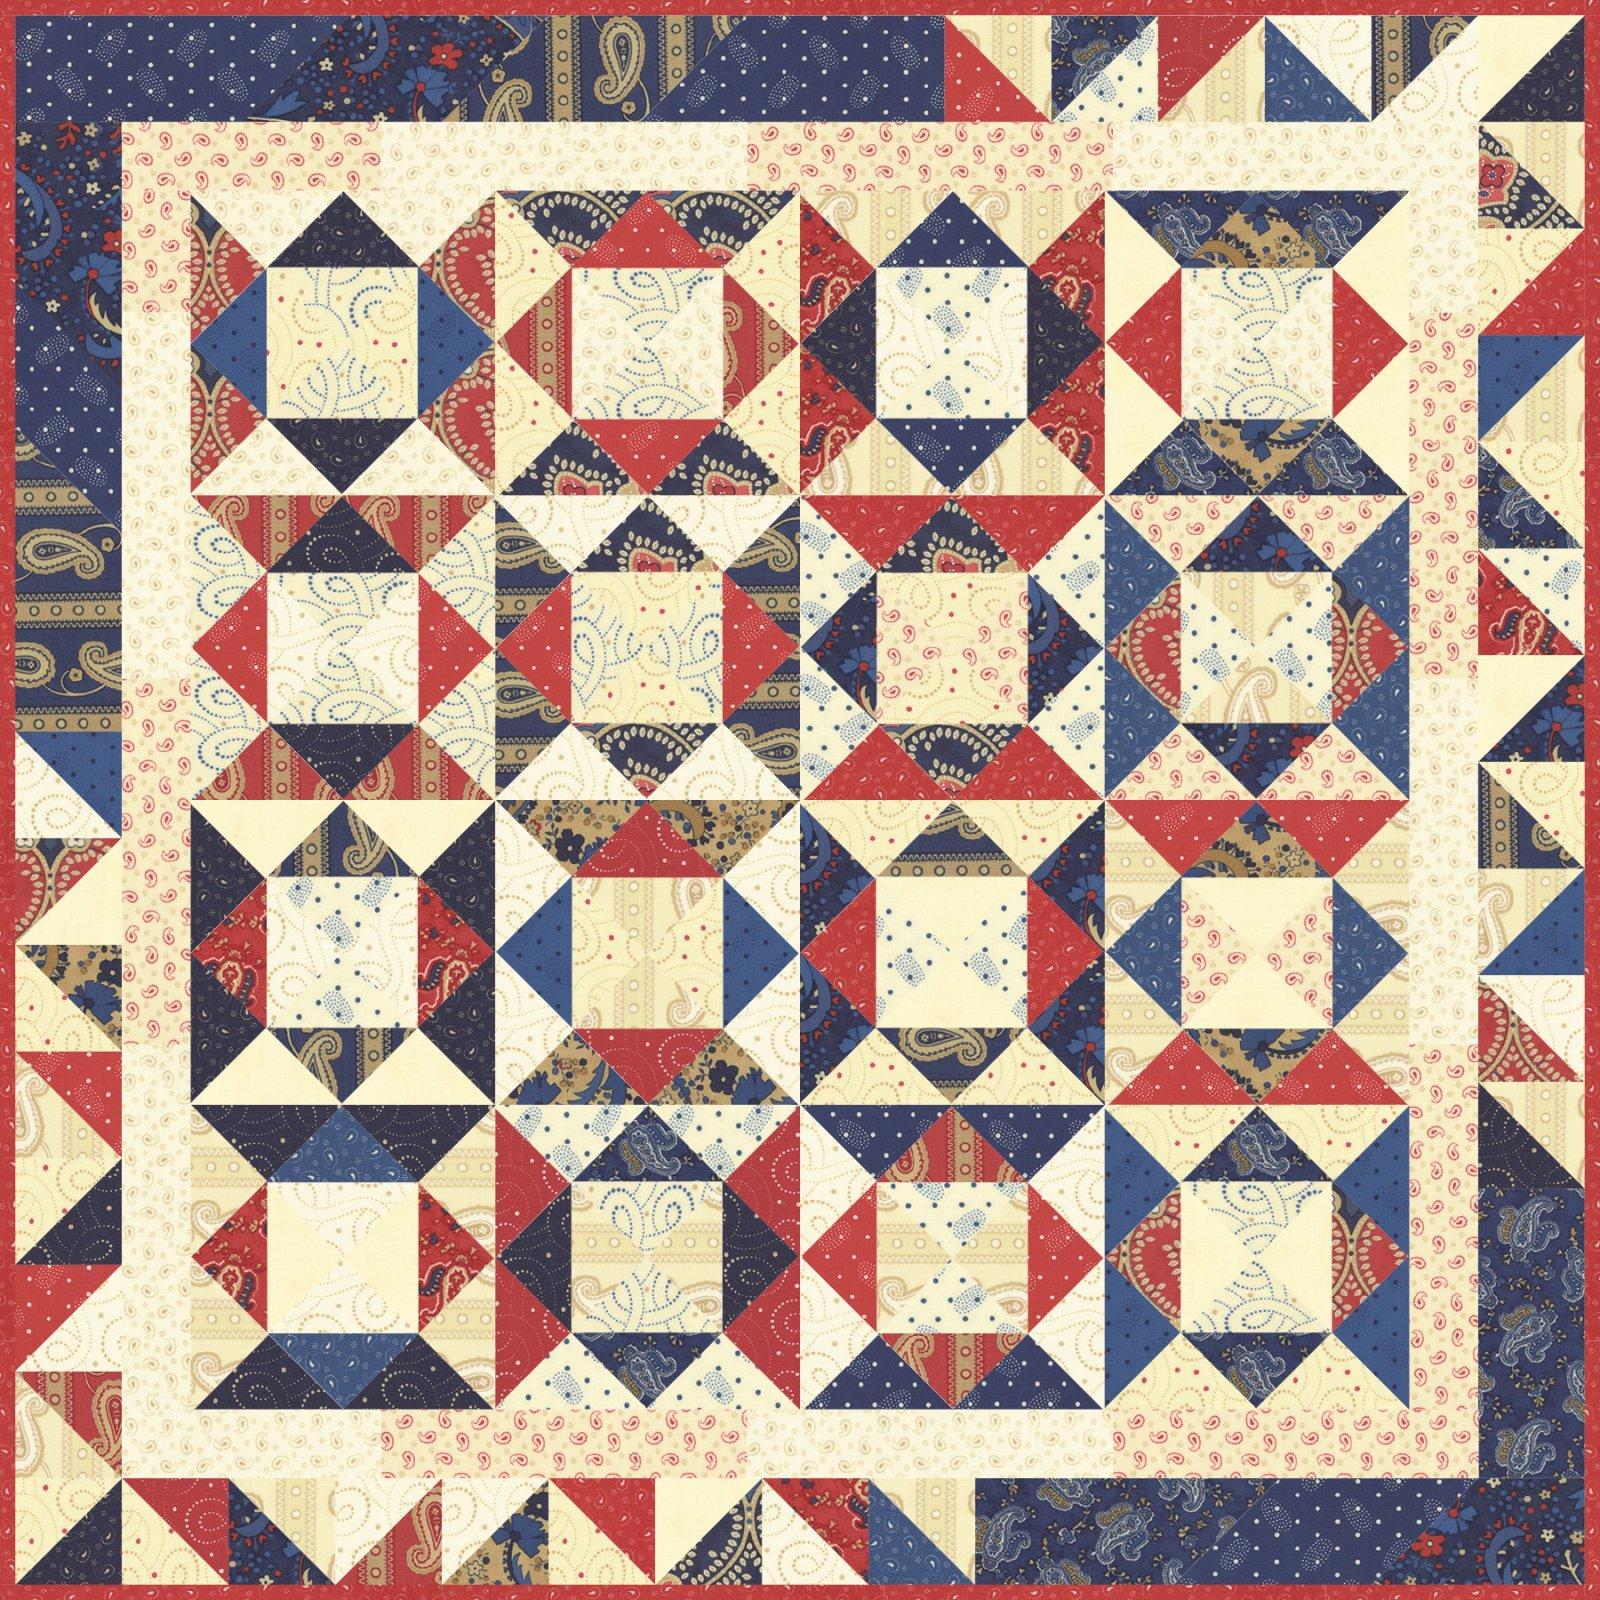 Moda frivol 2 polka dots paisleys by minick simpson quilt kit - Quilt rits ...